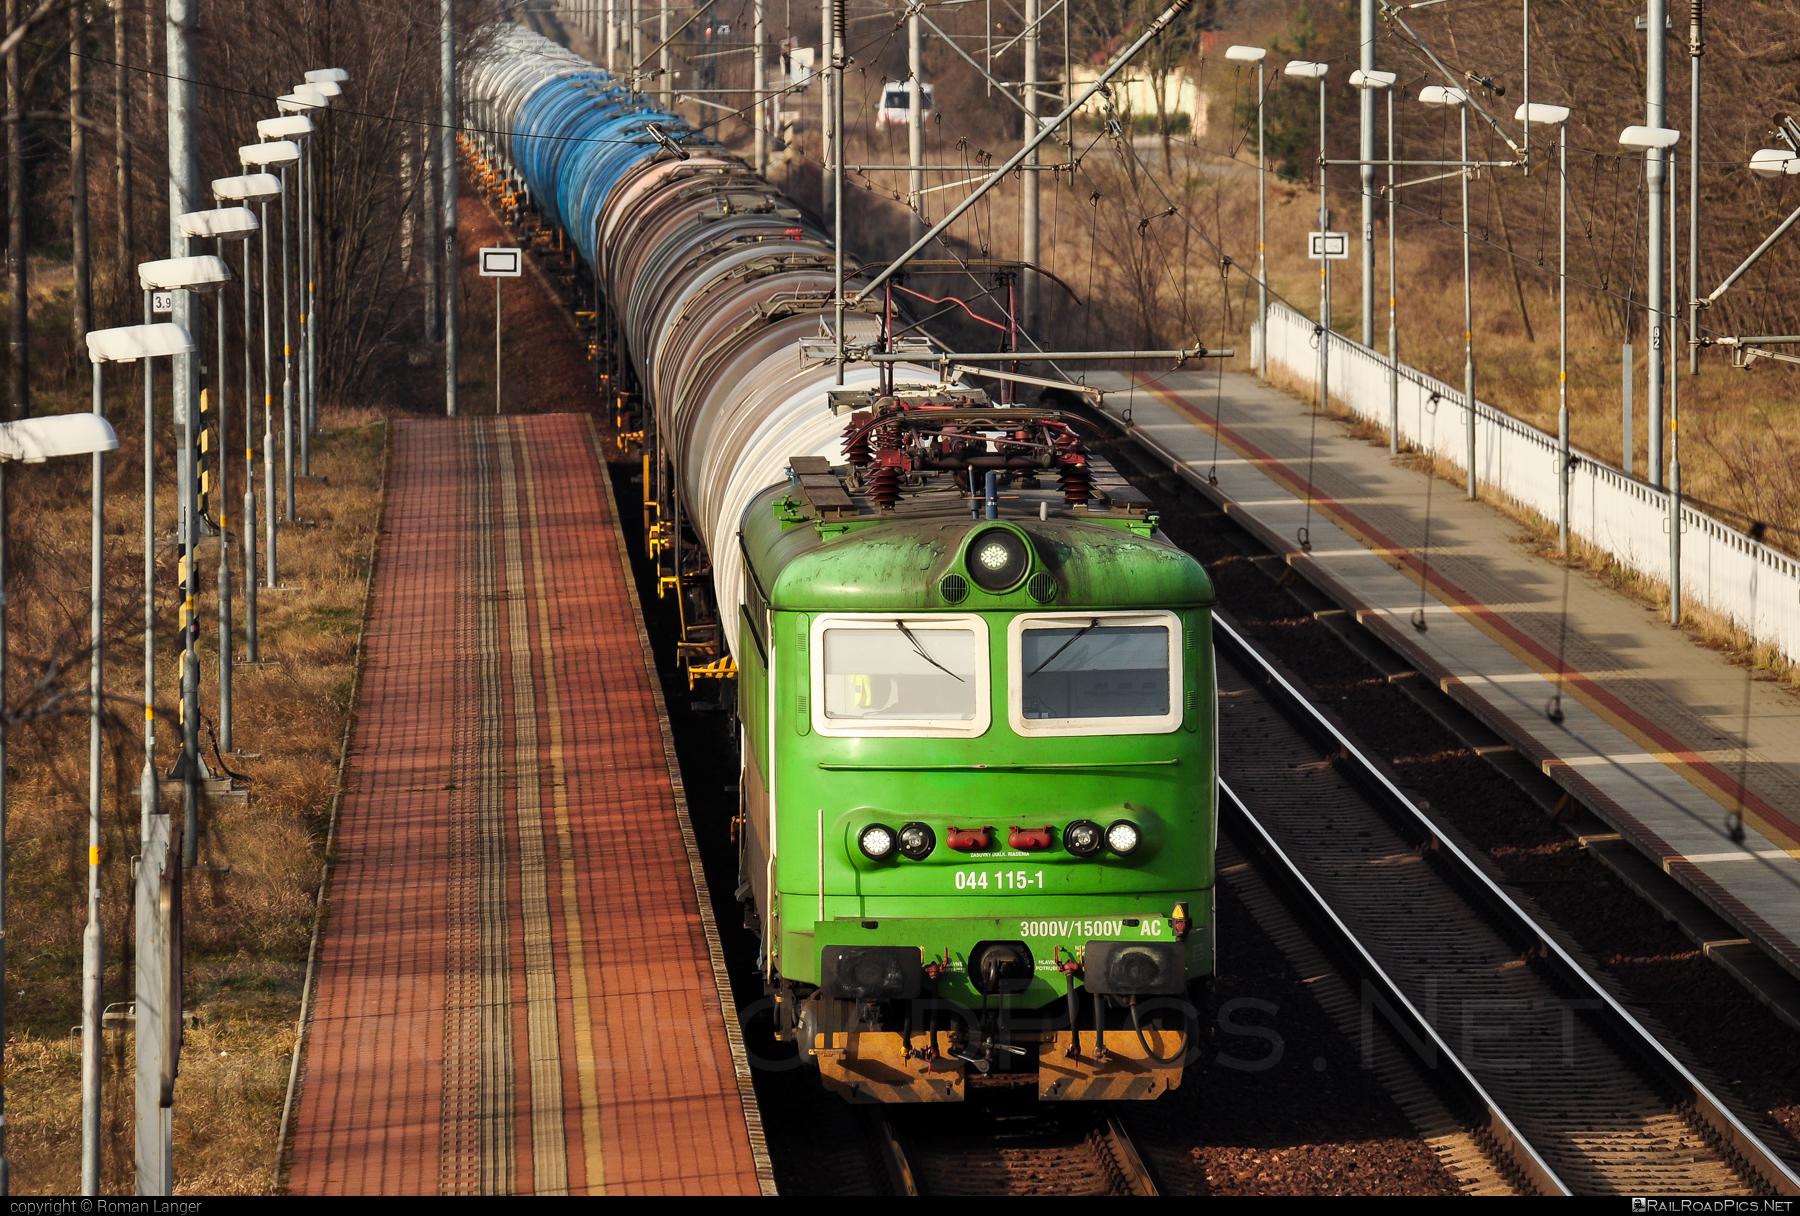 Škoda 73E - 044 115-1 operated by Railtrans International, s.r.o #RailtransInternational #kesselwagen #locomotive242 #plechac #rti #skoda #skoda73e #tankwagon